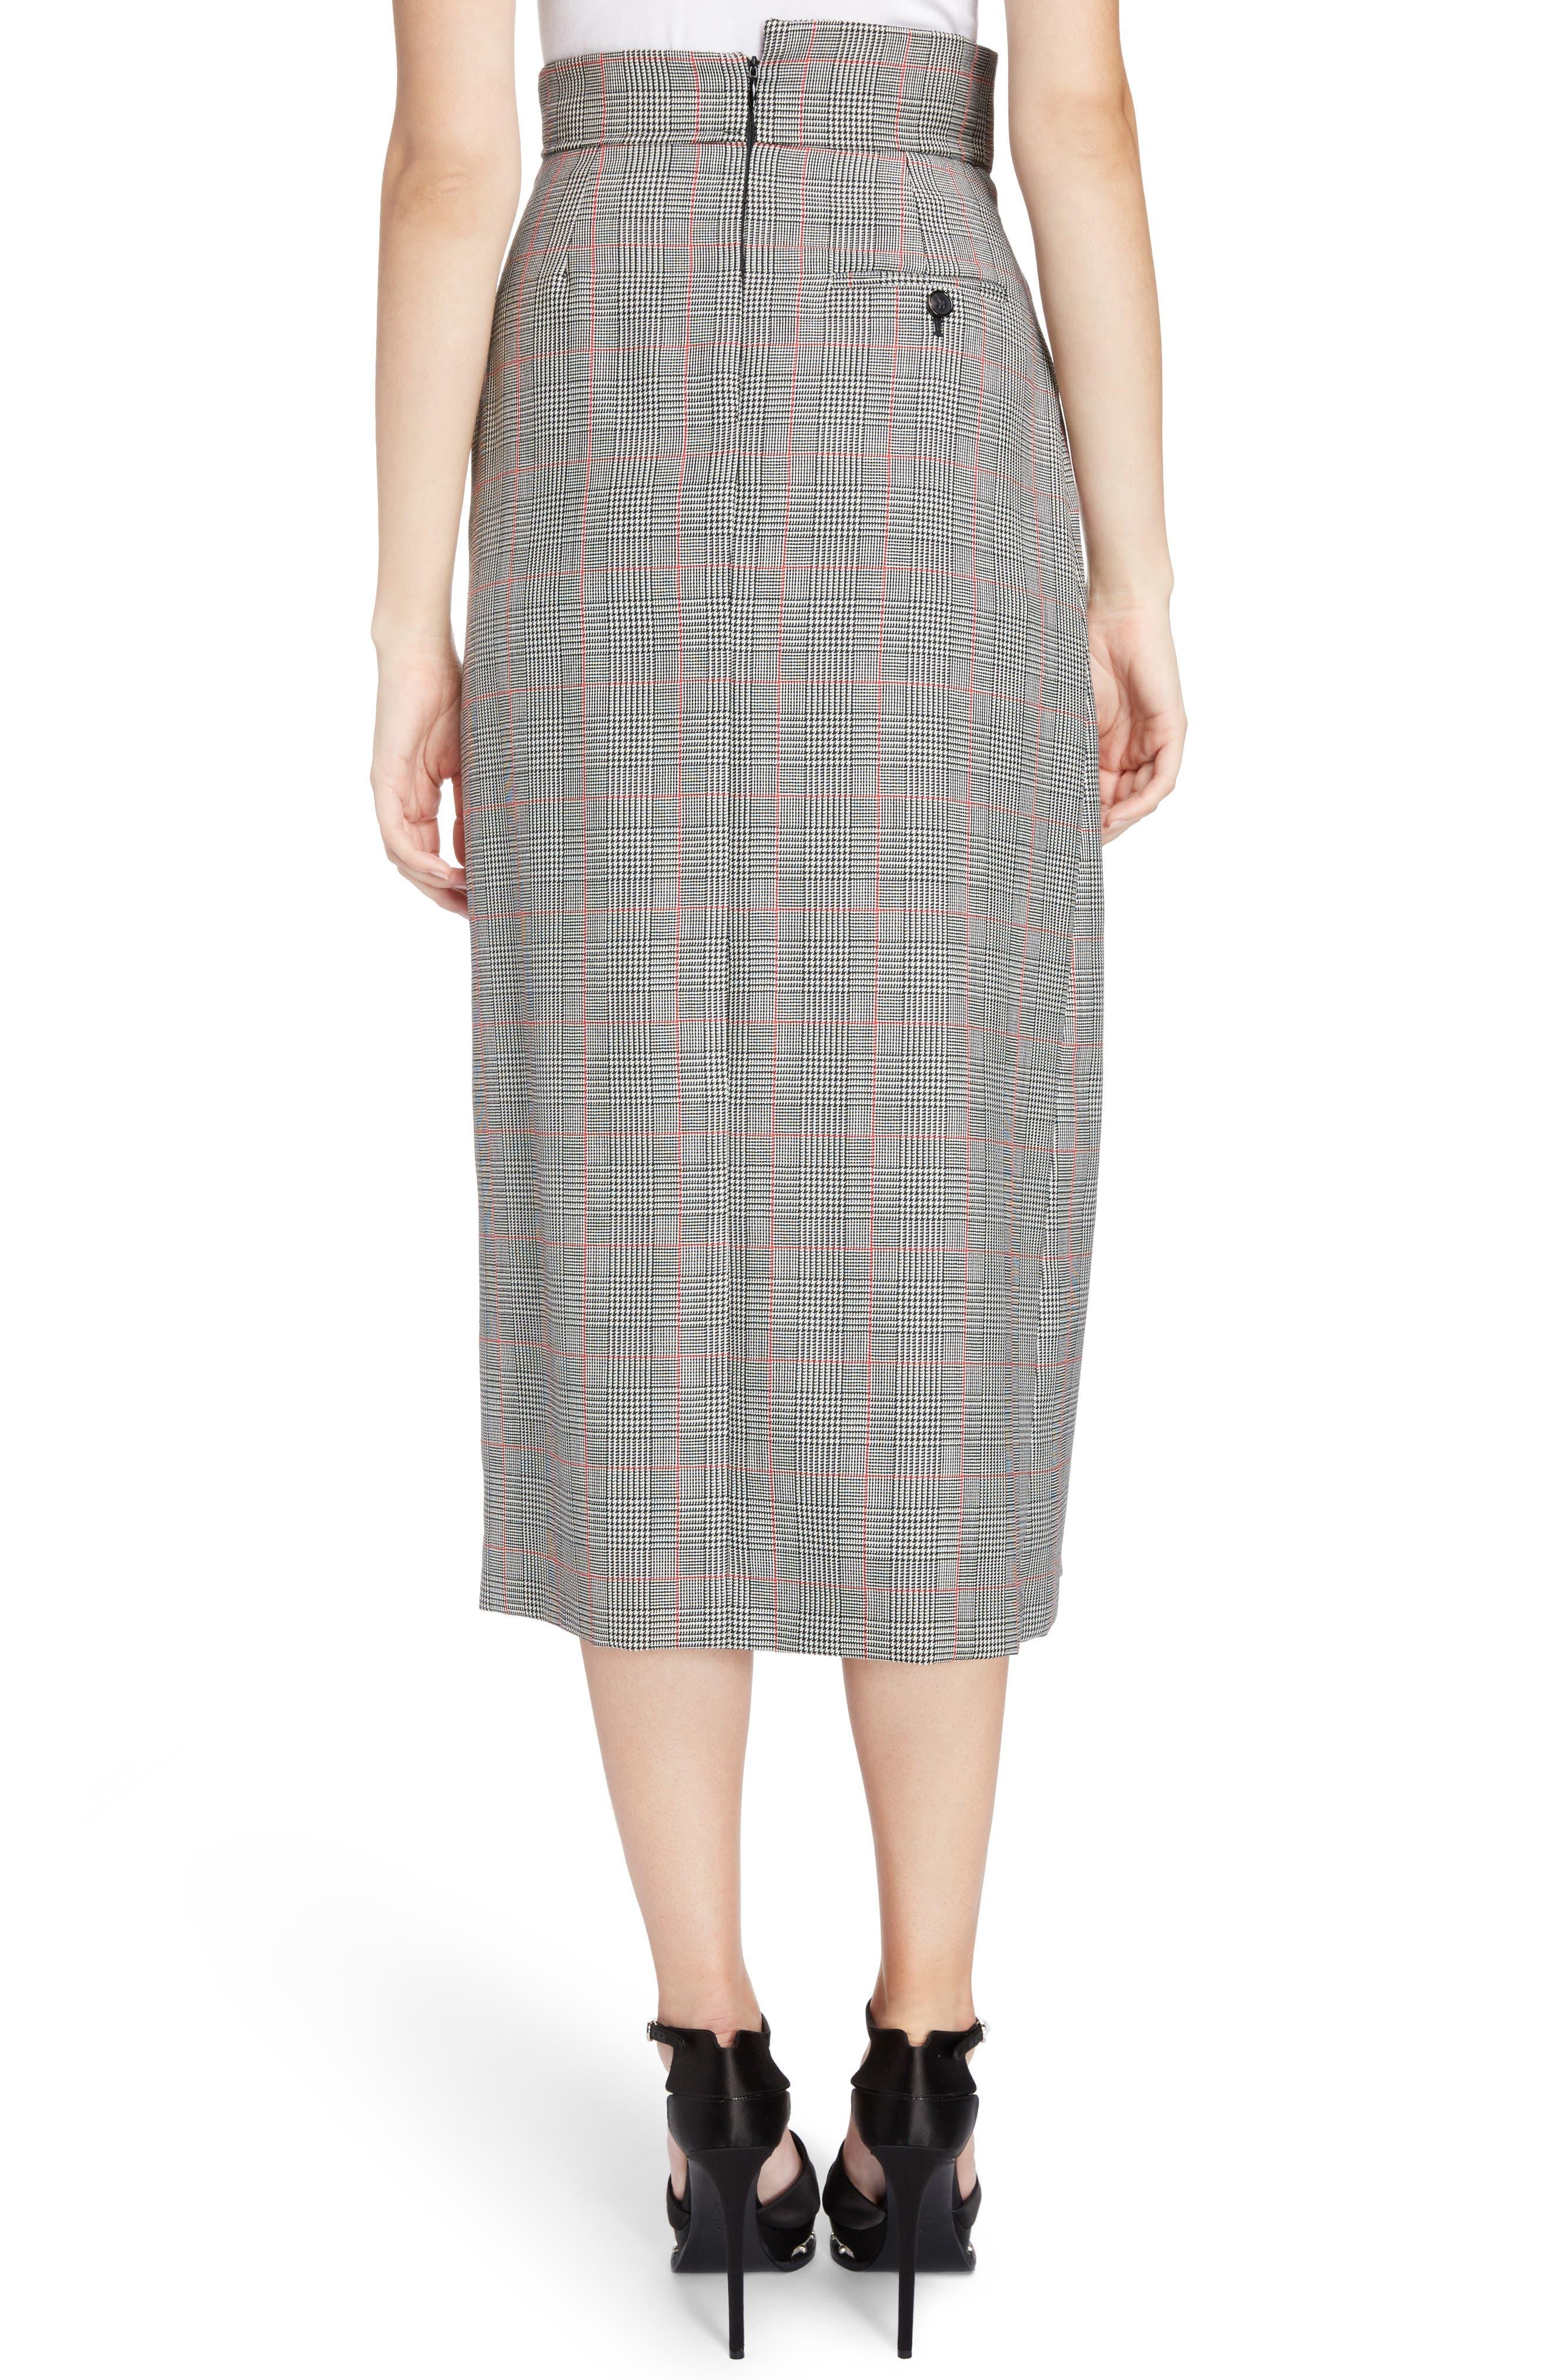 Prince of Wales Check Midi Skirt,                             Alternate thumbnail 2, color,                             086